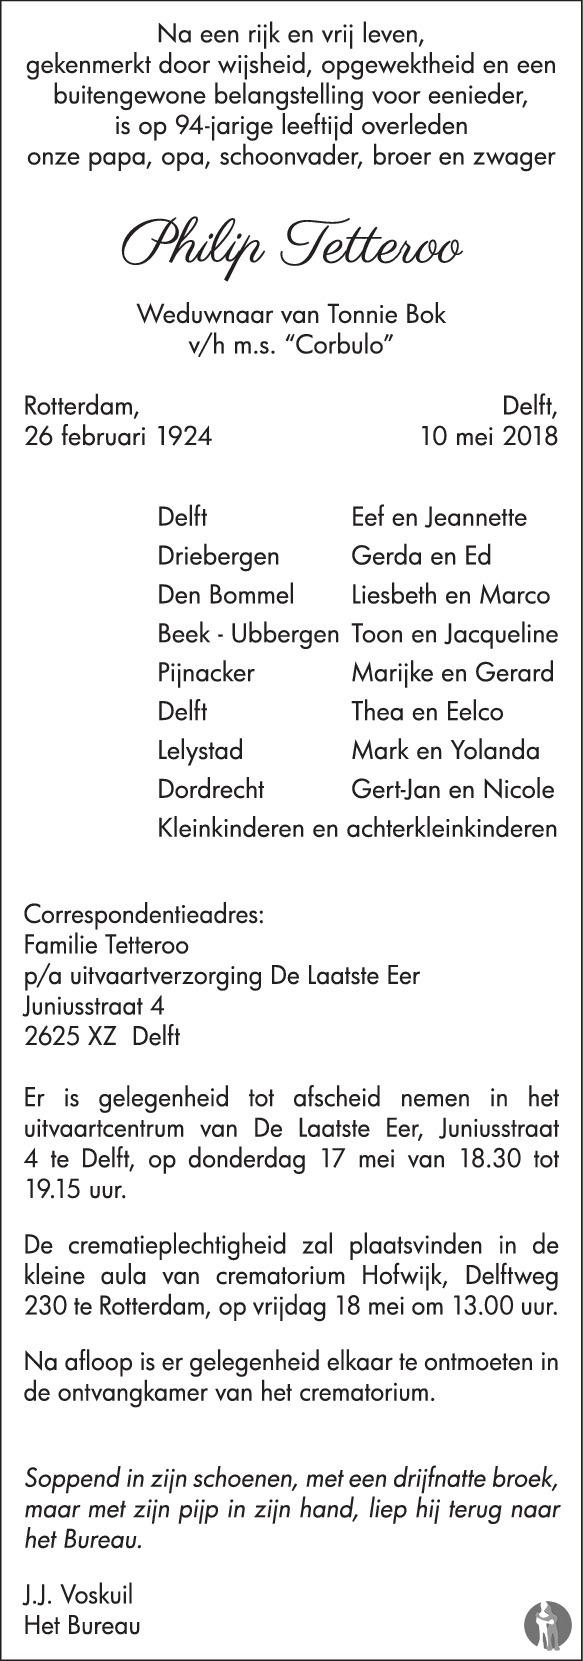 Overlijdensbericht van Philip Tetteroo in Delftse Post